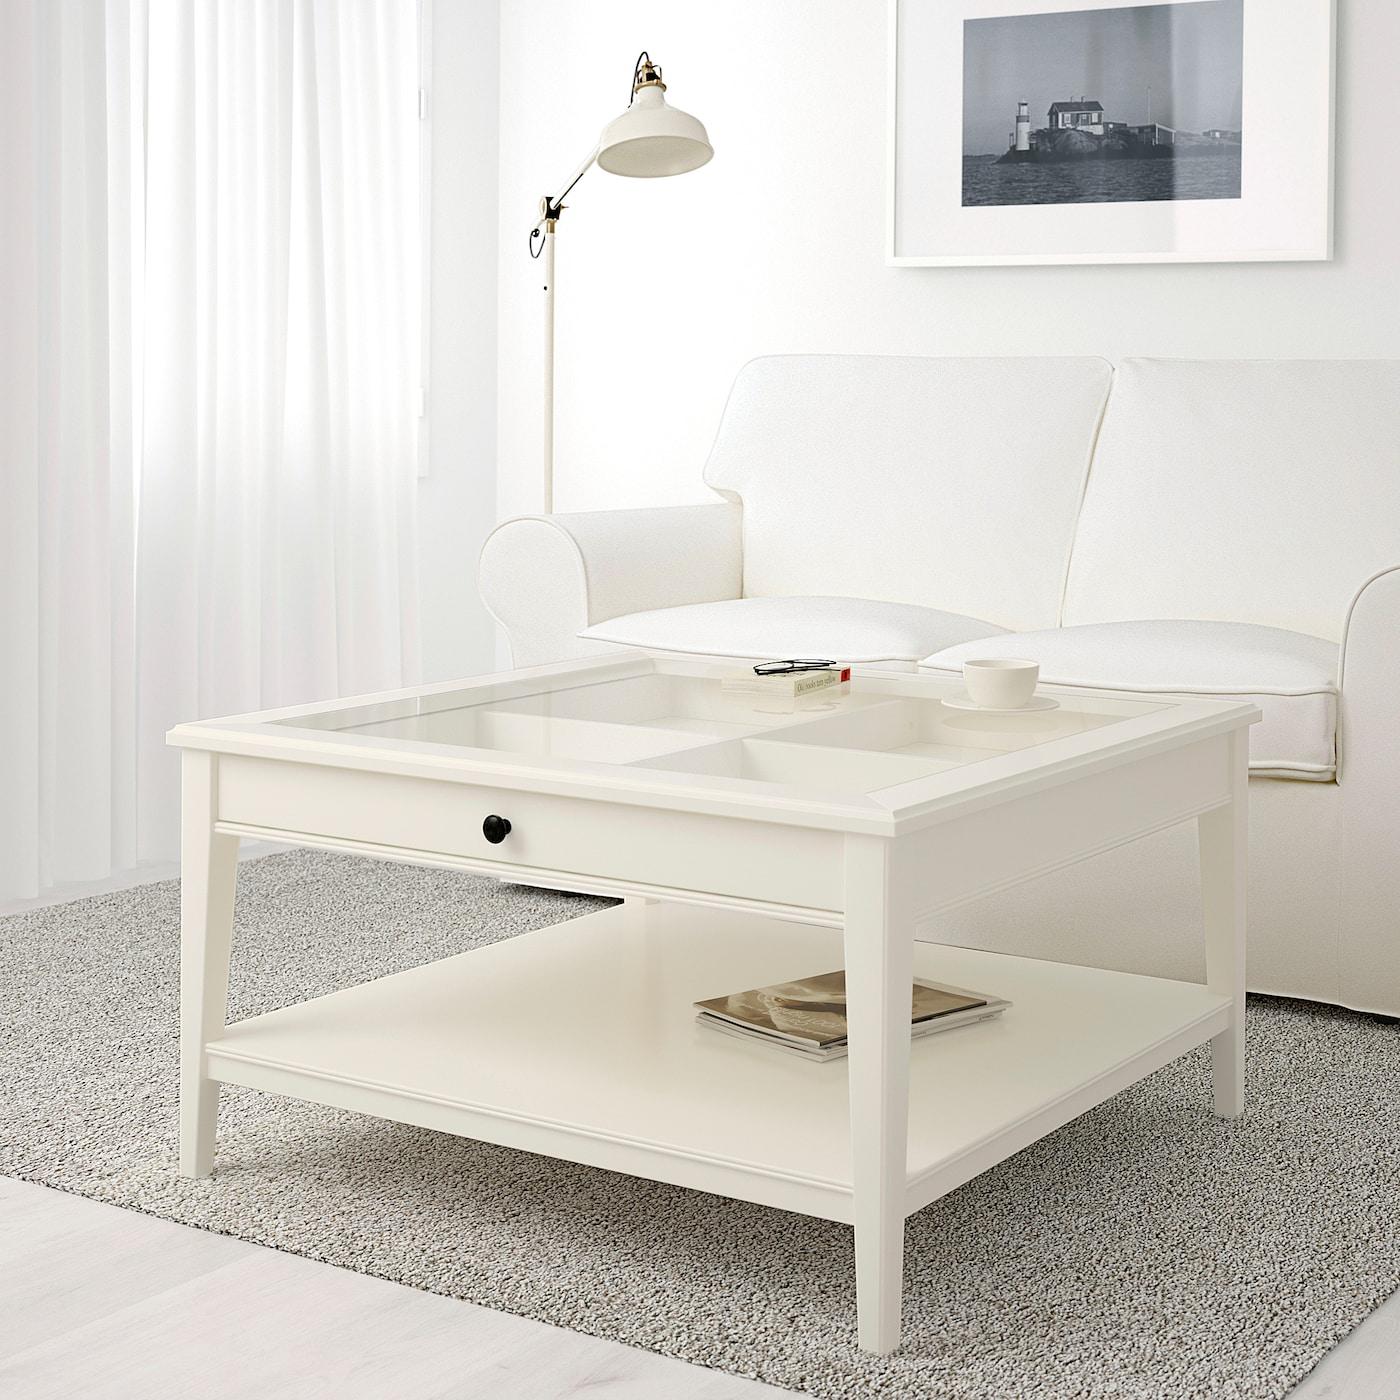 Liatorp Coffee Table White Glass 93x93 Cm Ikea Ireland [ 1400 x 1400 Pixel ]